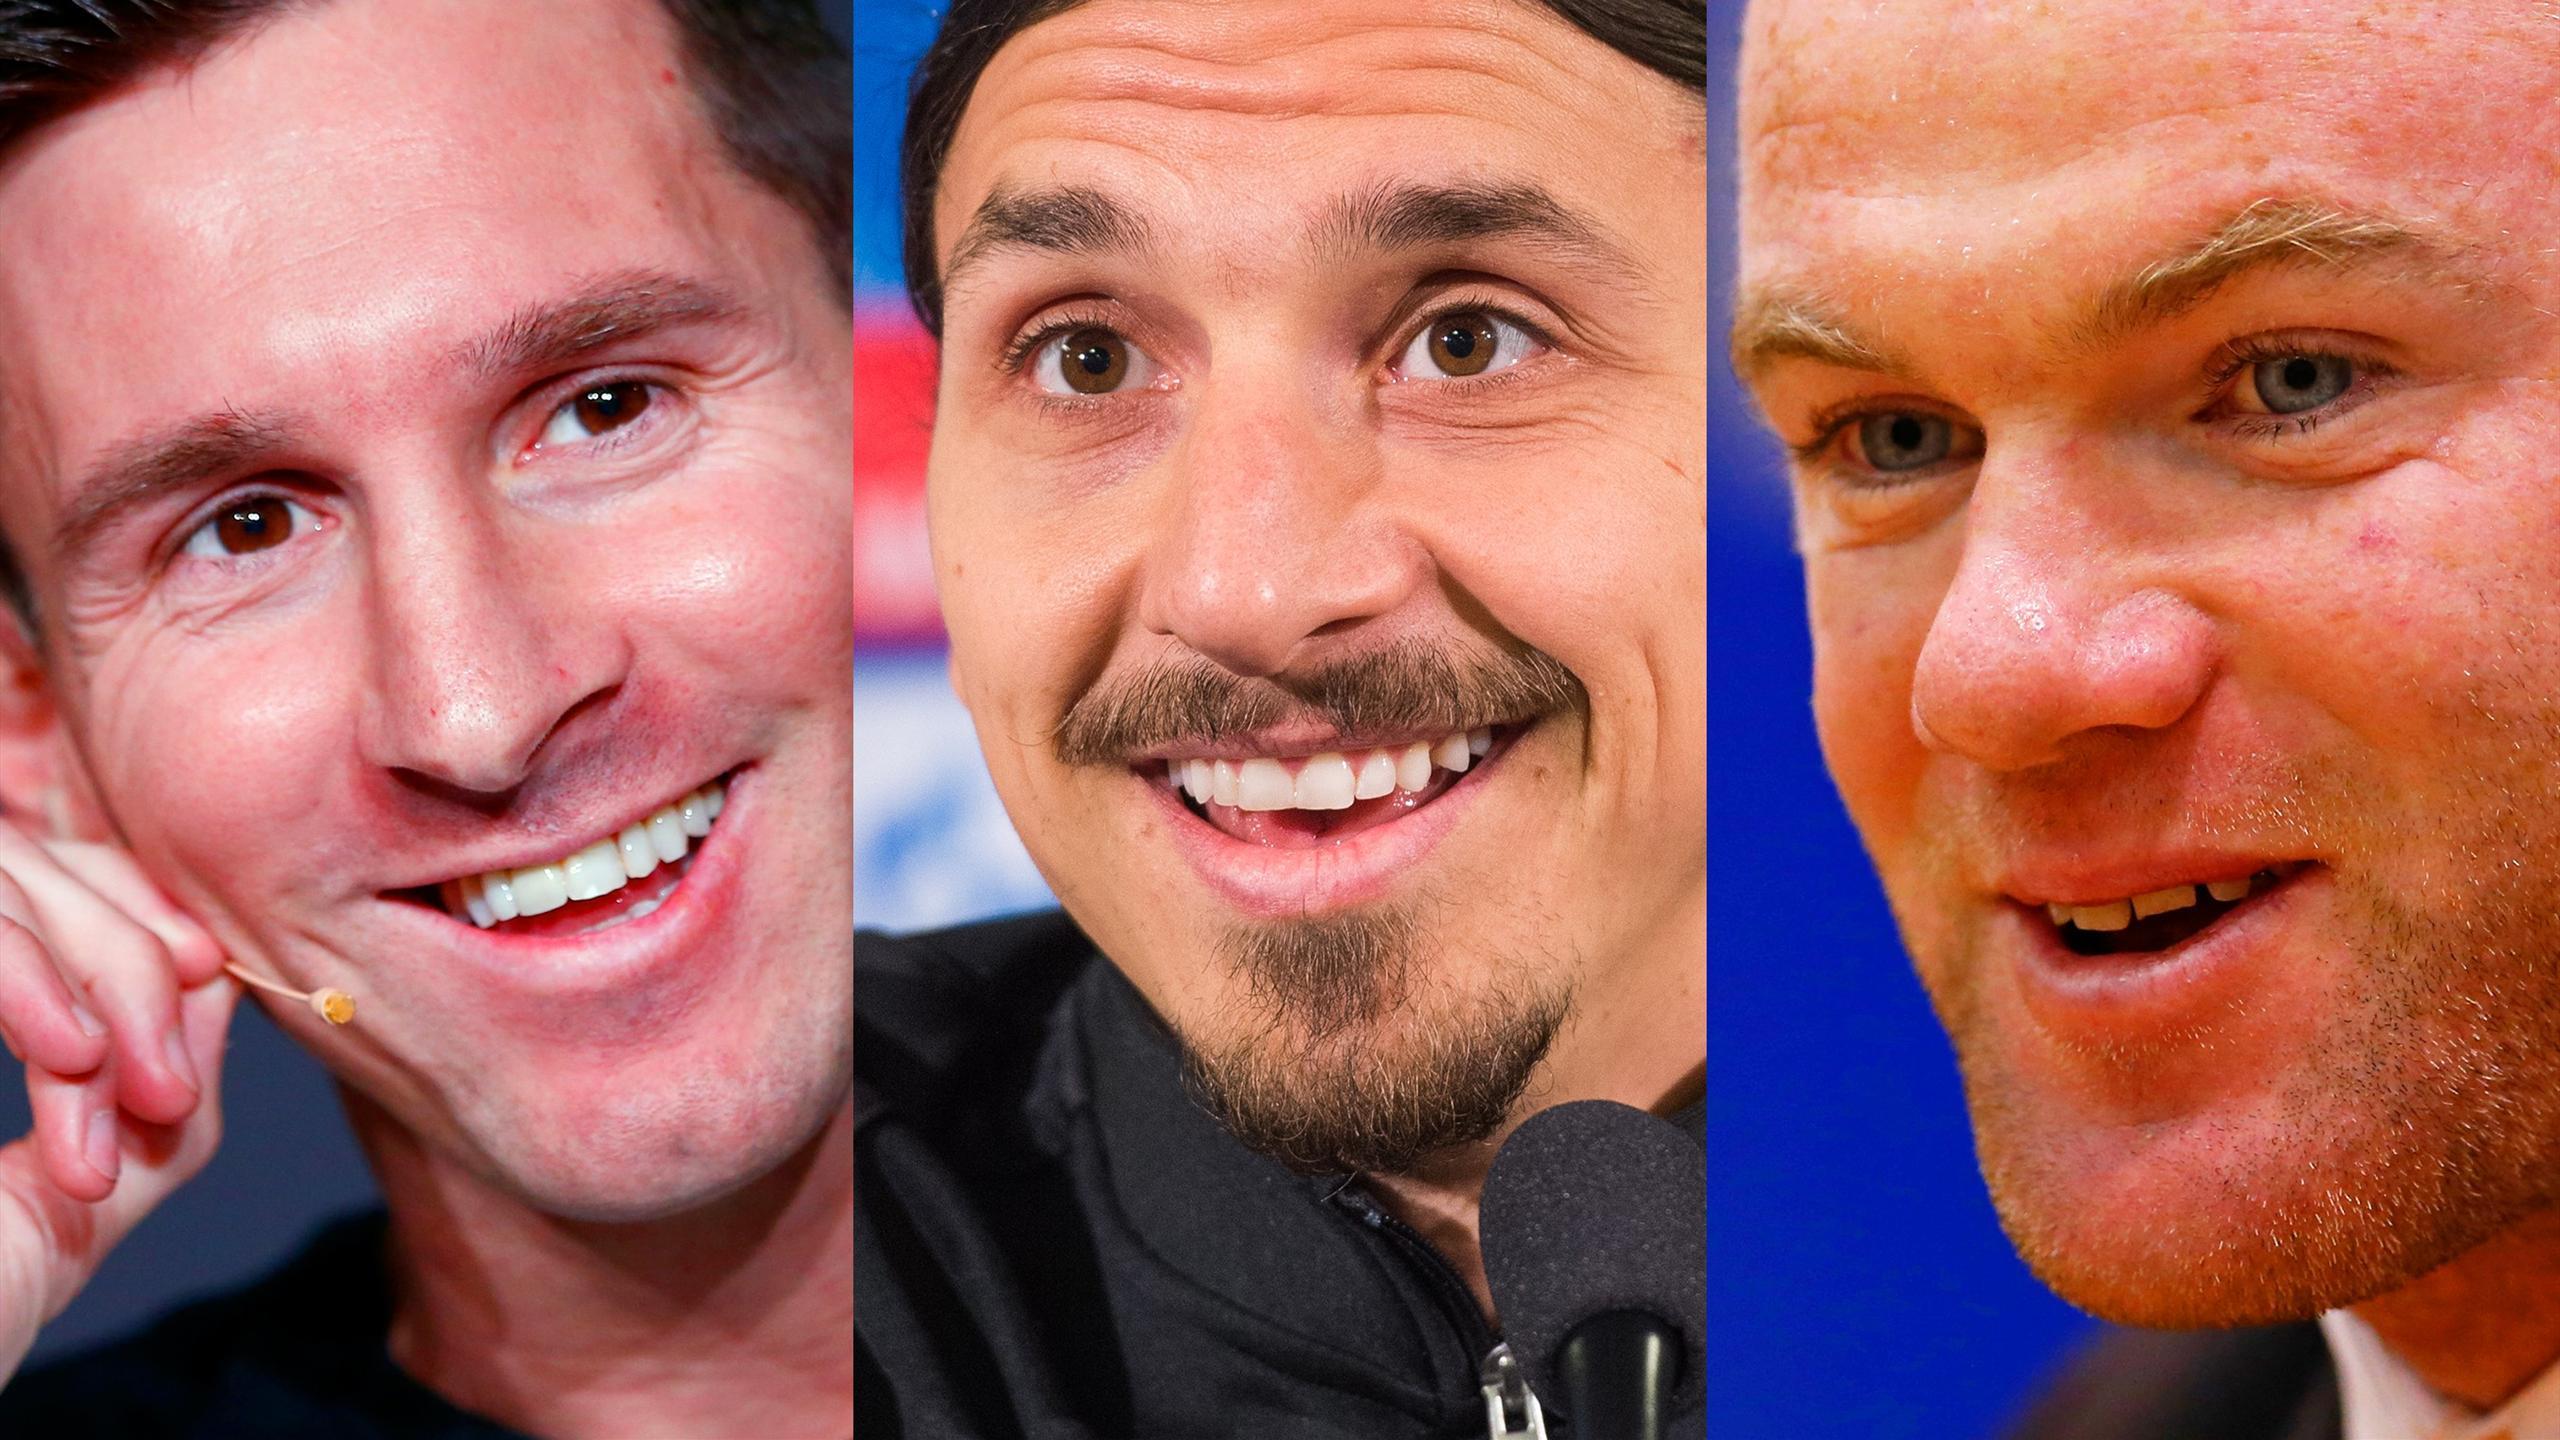 Lionel Messi, Zlatan Ibrahimovic and Wayne Rooney